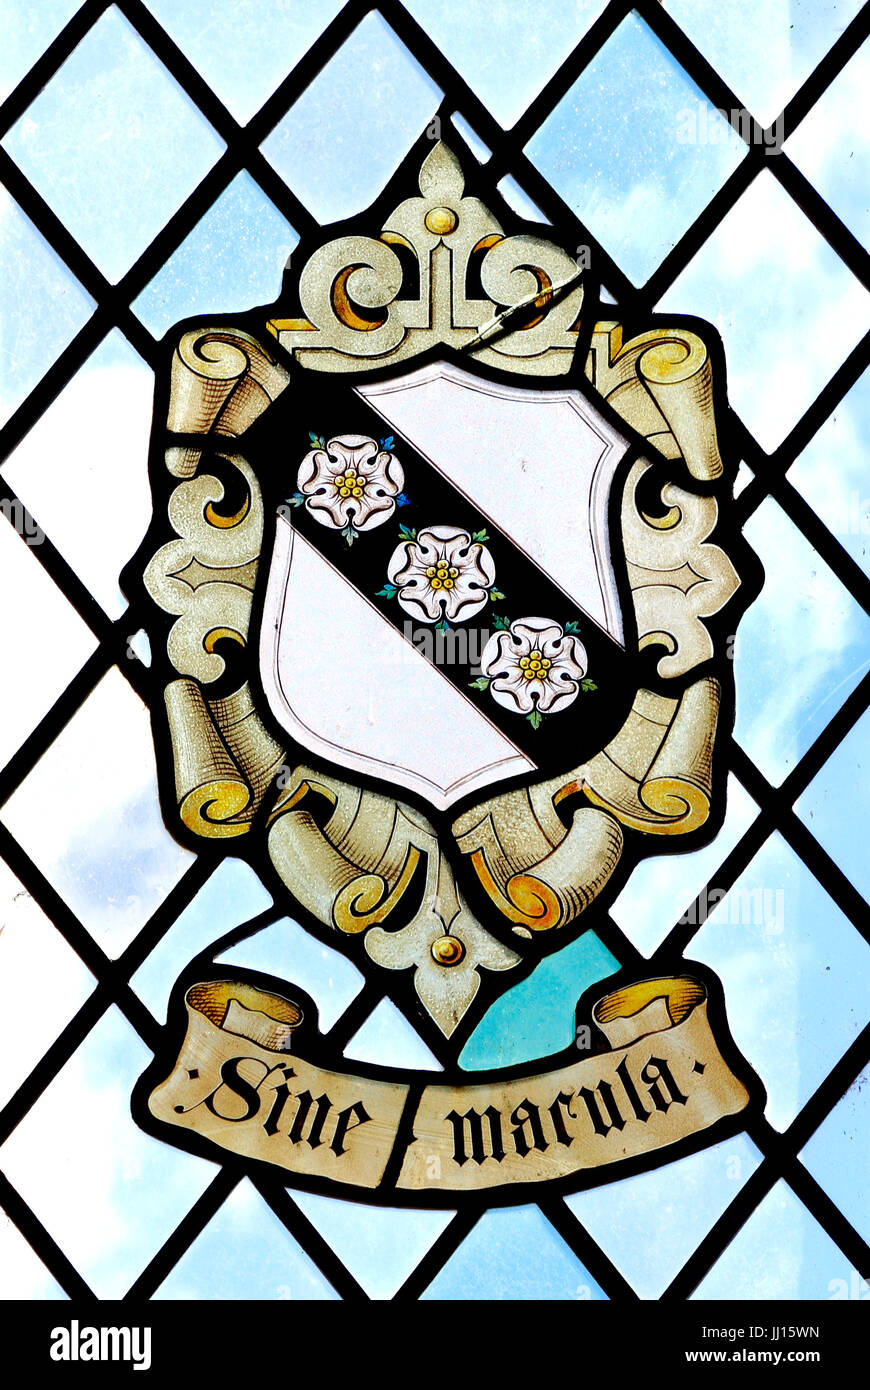 Sine Macula, ohne Makel, ohne Flecken, Heraldik, Heraldik, Buntglasfenster von Carey Family, East Barsham Manor, Stockbild